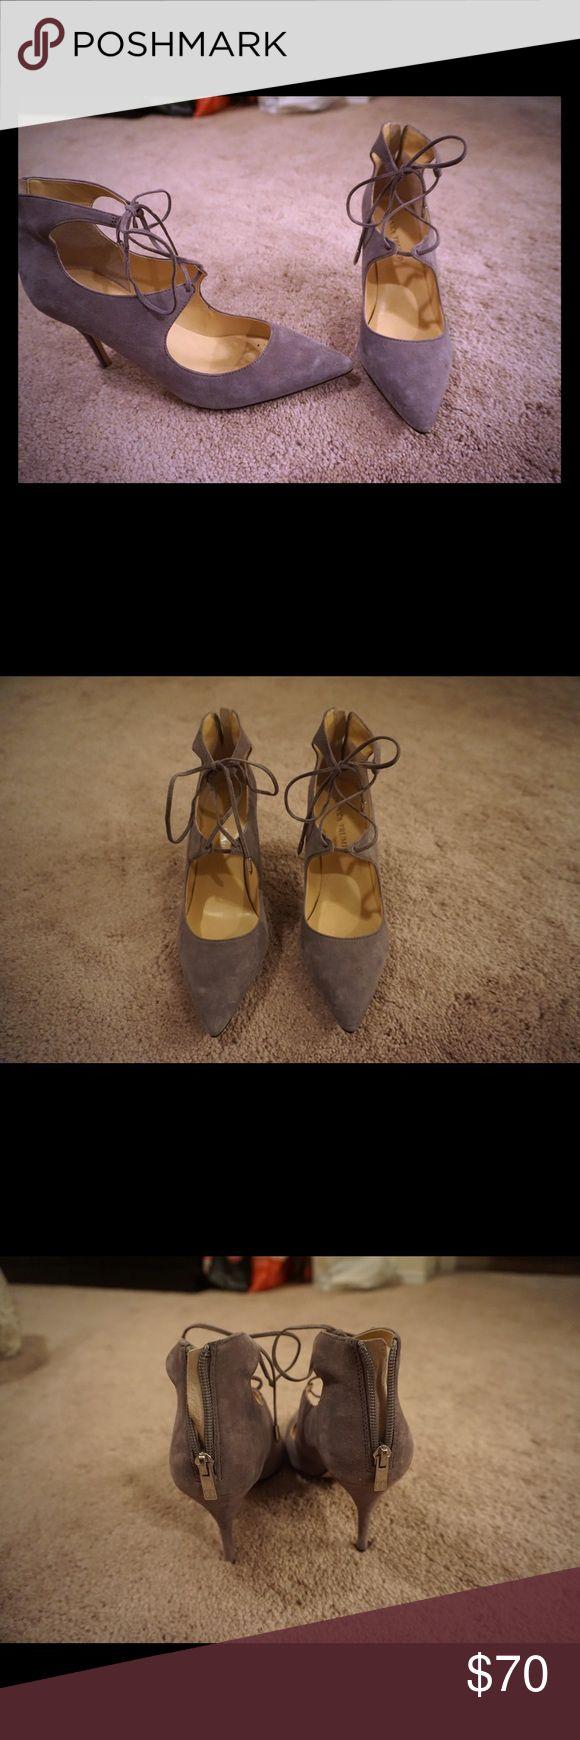 Ivanka Trump Tie up heels Gray Ivanka Trump tie up heels, worn once Ivanka Trump Shoes Heels